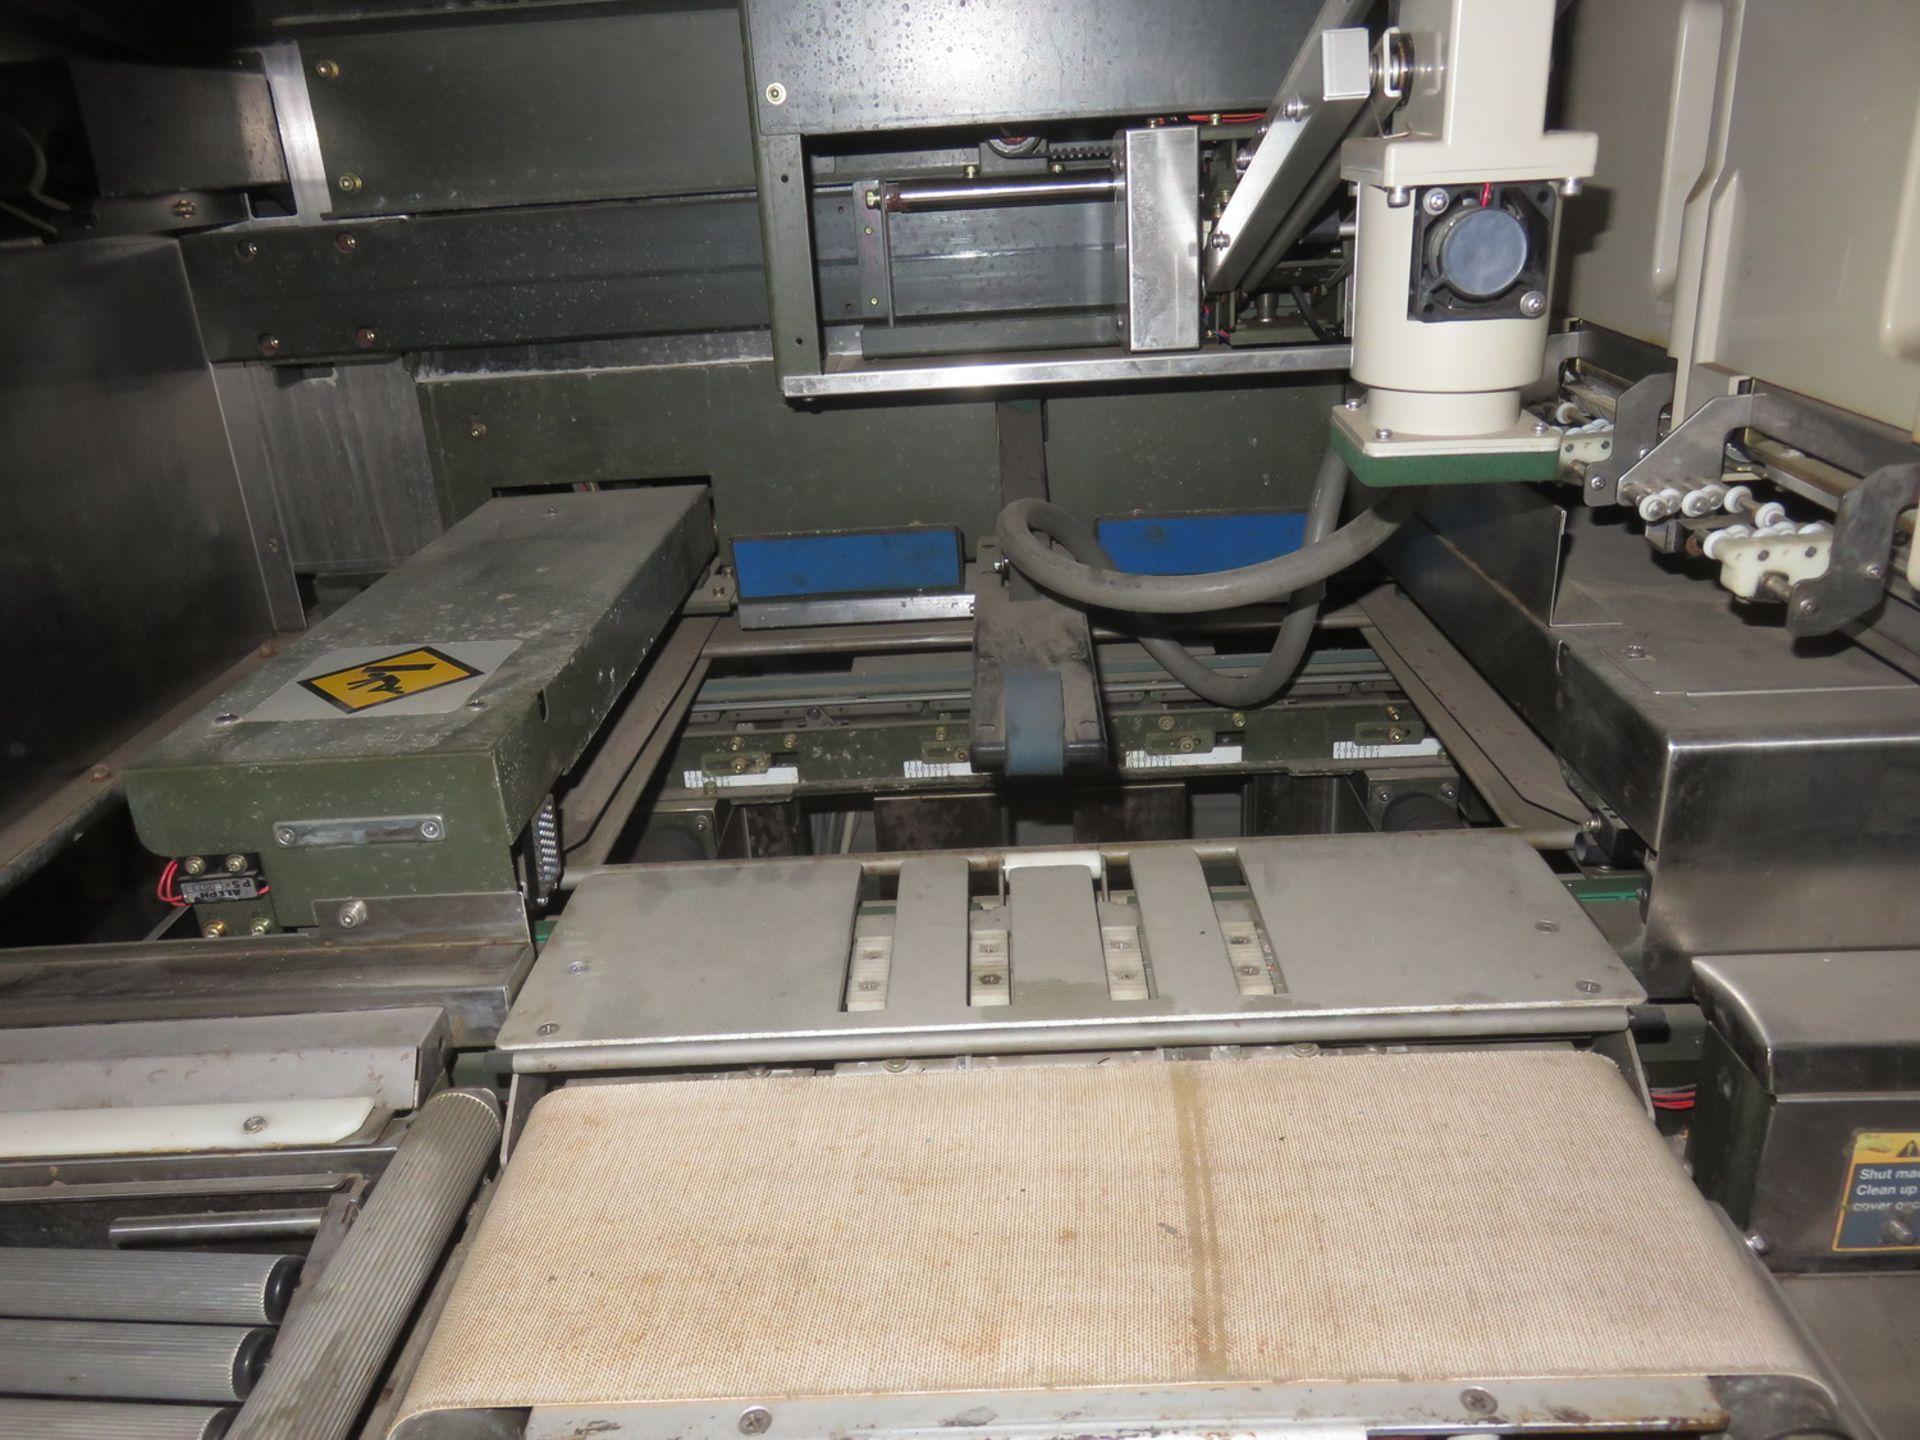 Lot 765 - DIGI MOD AW-3600 GENERAL AUTO PACKAGING MACHINE